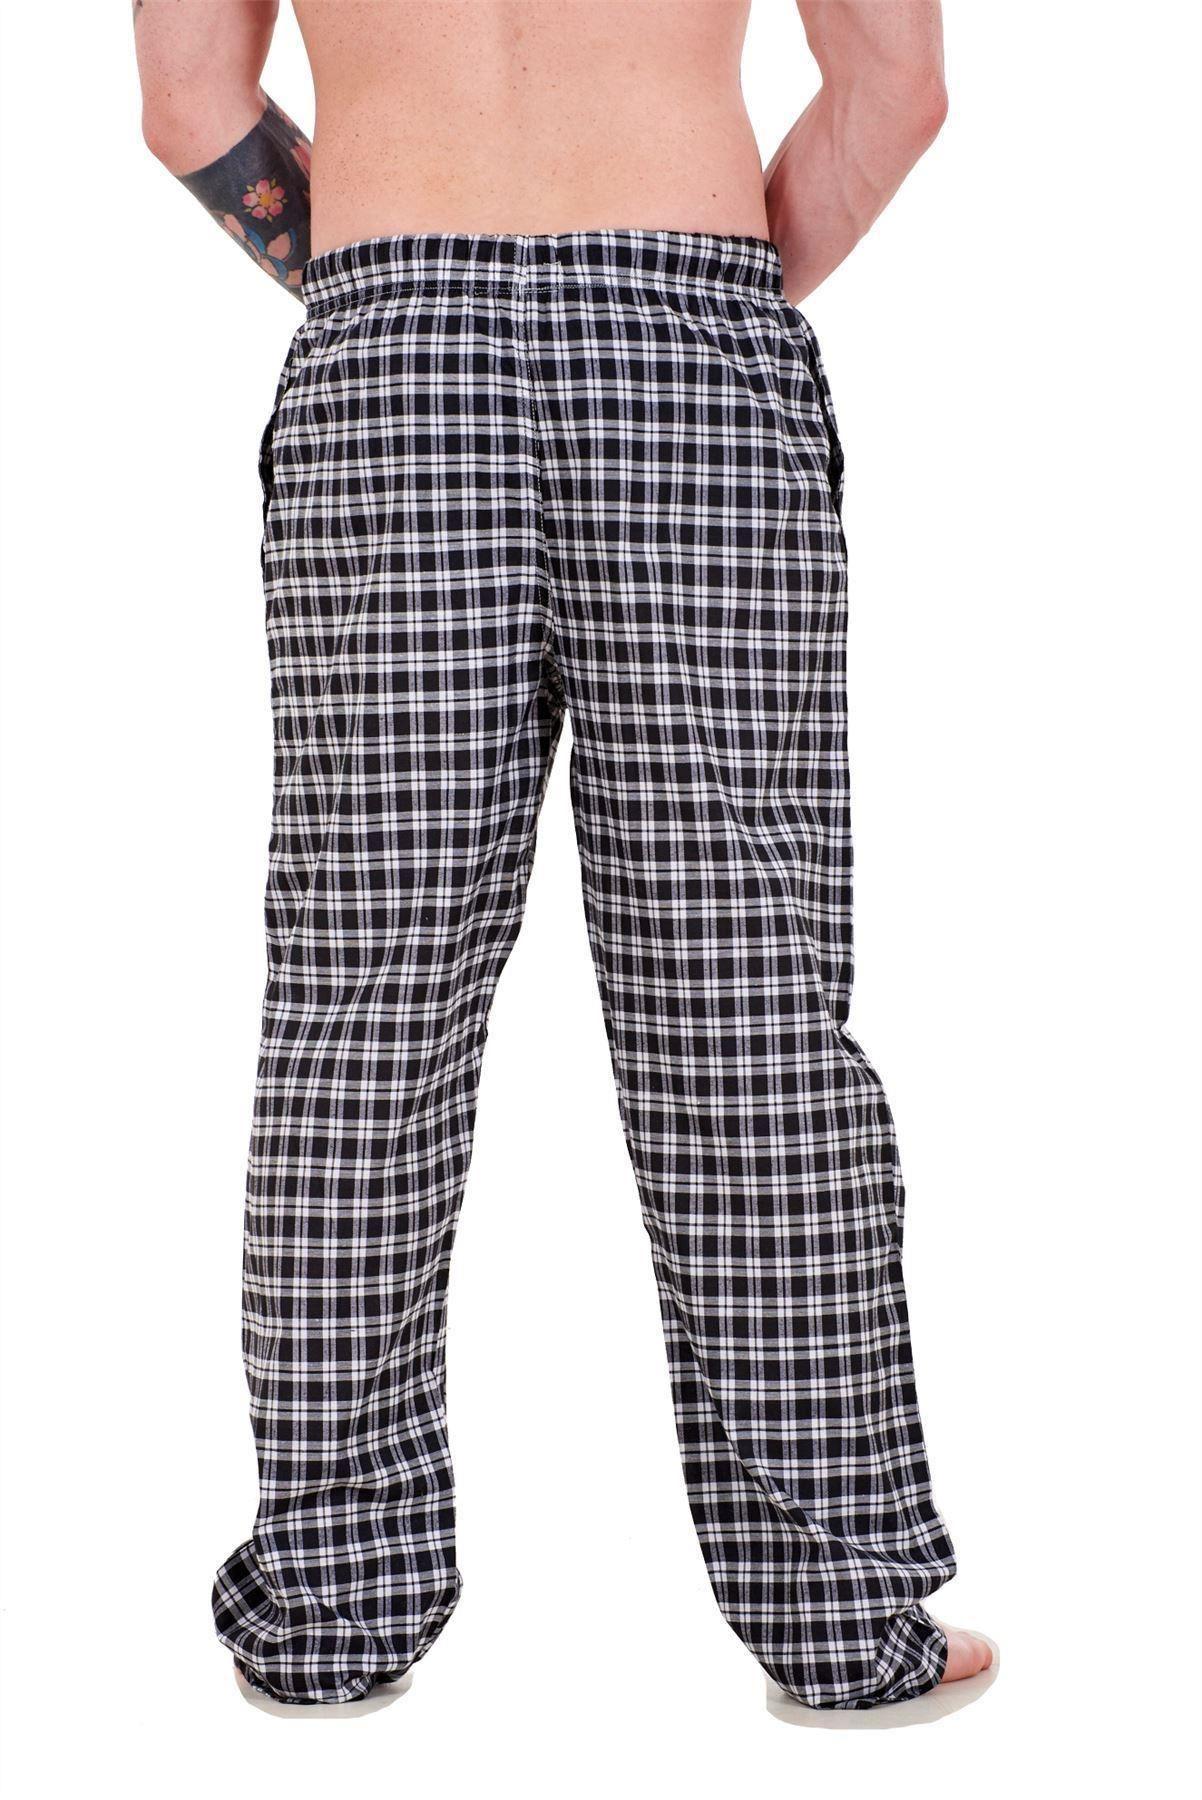 Mens-Pyjama-Bottoms-Rich-Cotton-Woven-Check-Lounge-Pant-Nightwear-Big-3XL-to-5XL Indexbild 10